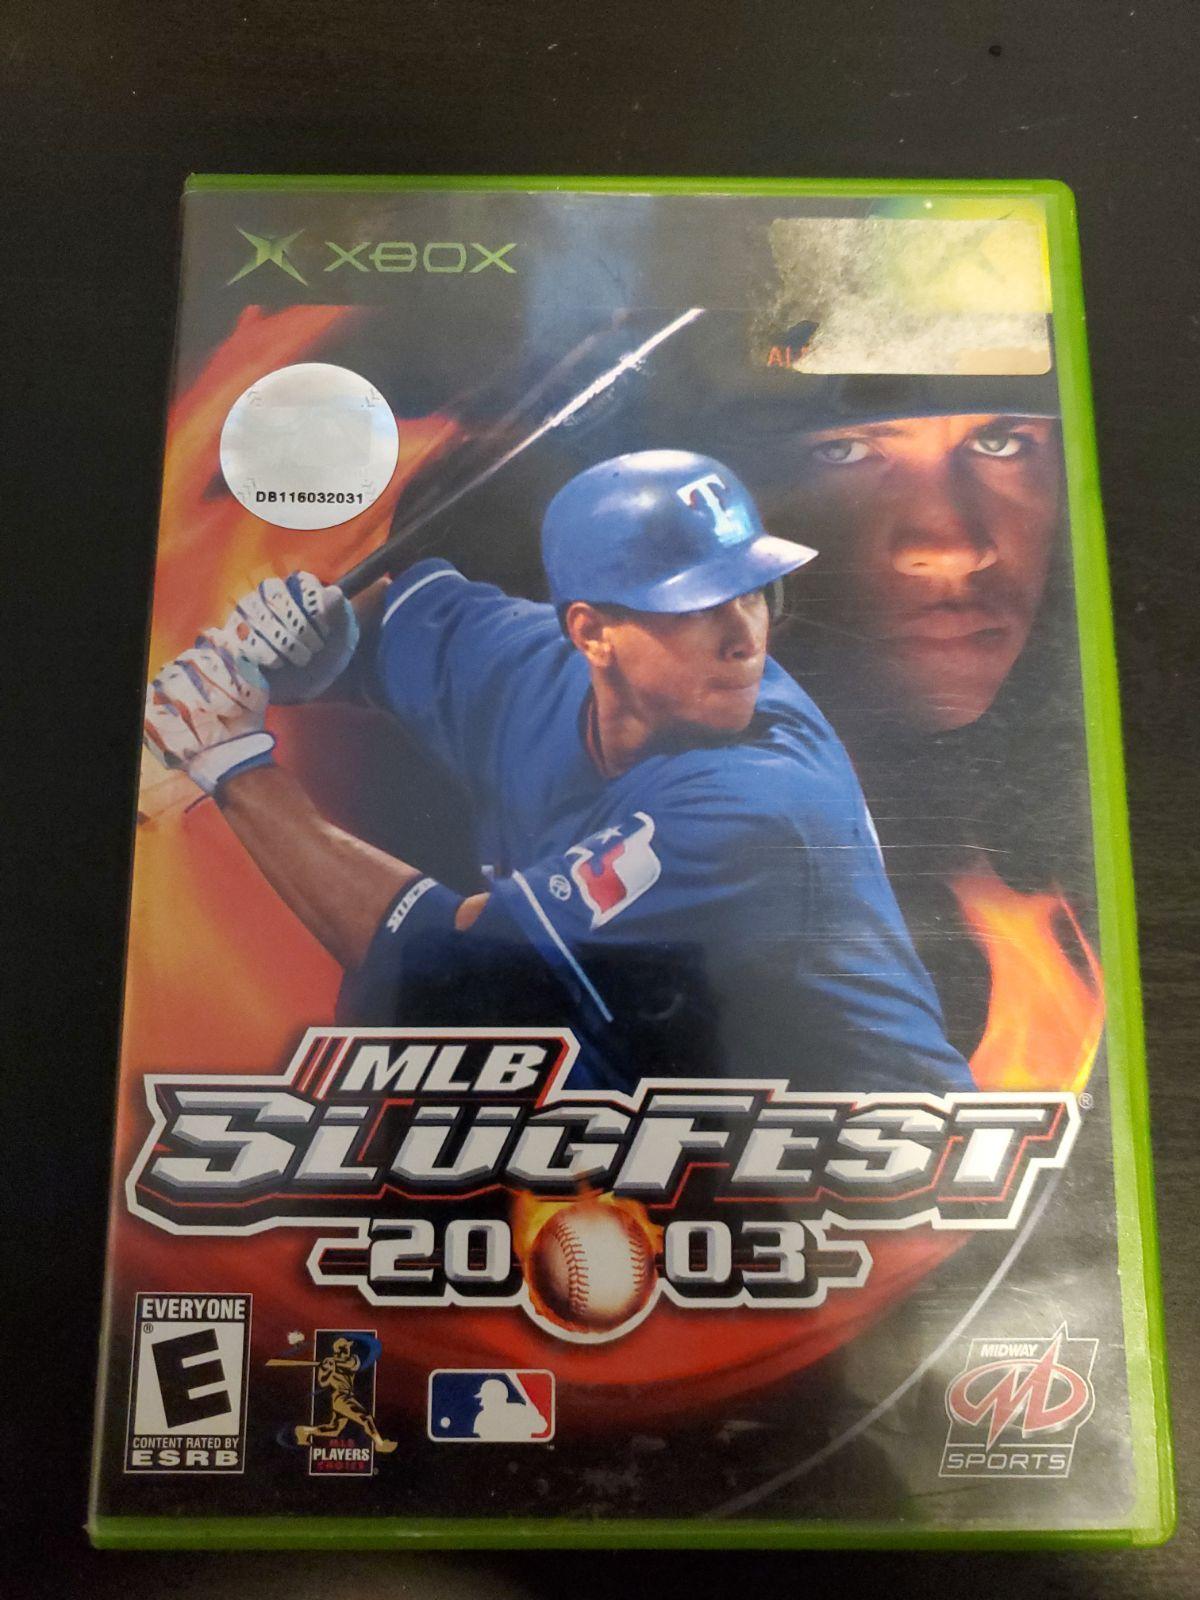 Mlb Slugfest 2003 Xbox Cleaned And Tested Xbox Mlb Baseball Cards